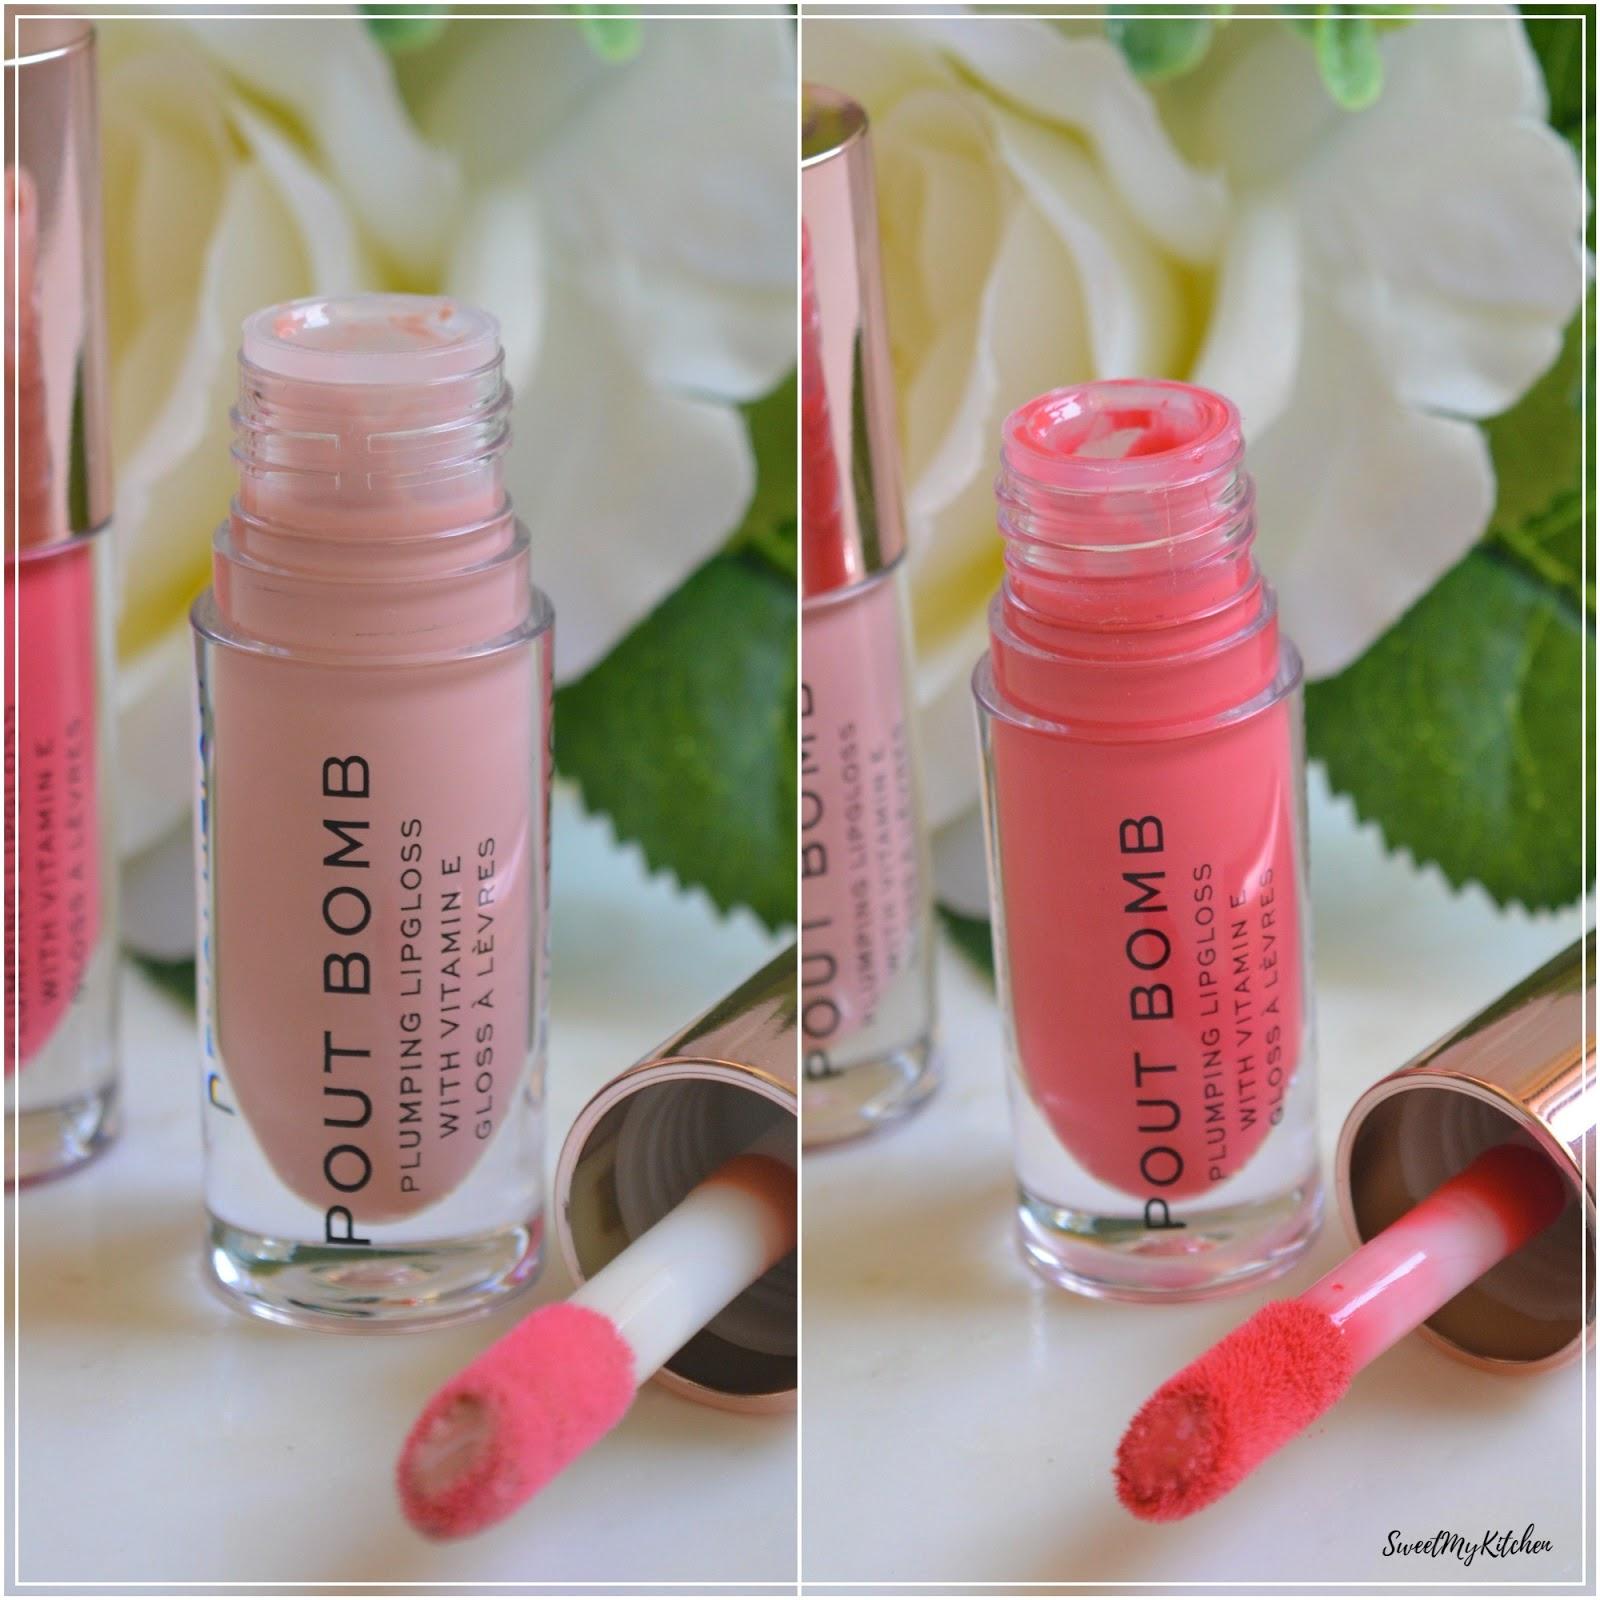 Makeup Revolution Pout Bomb Candy Peachy